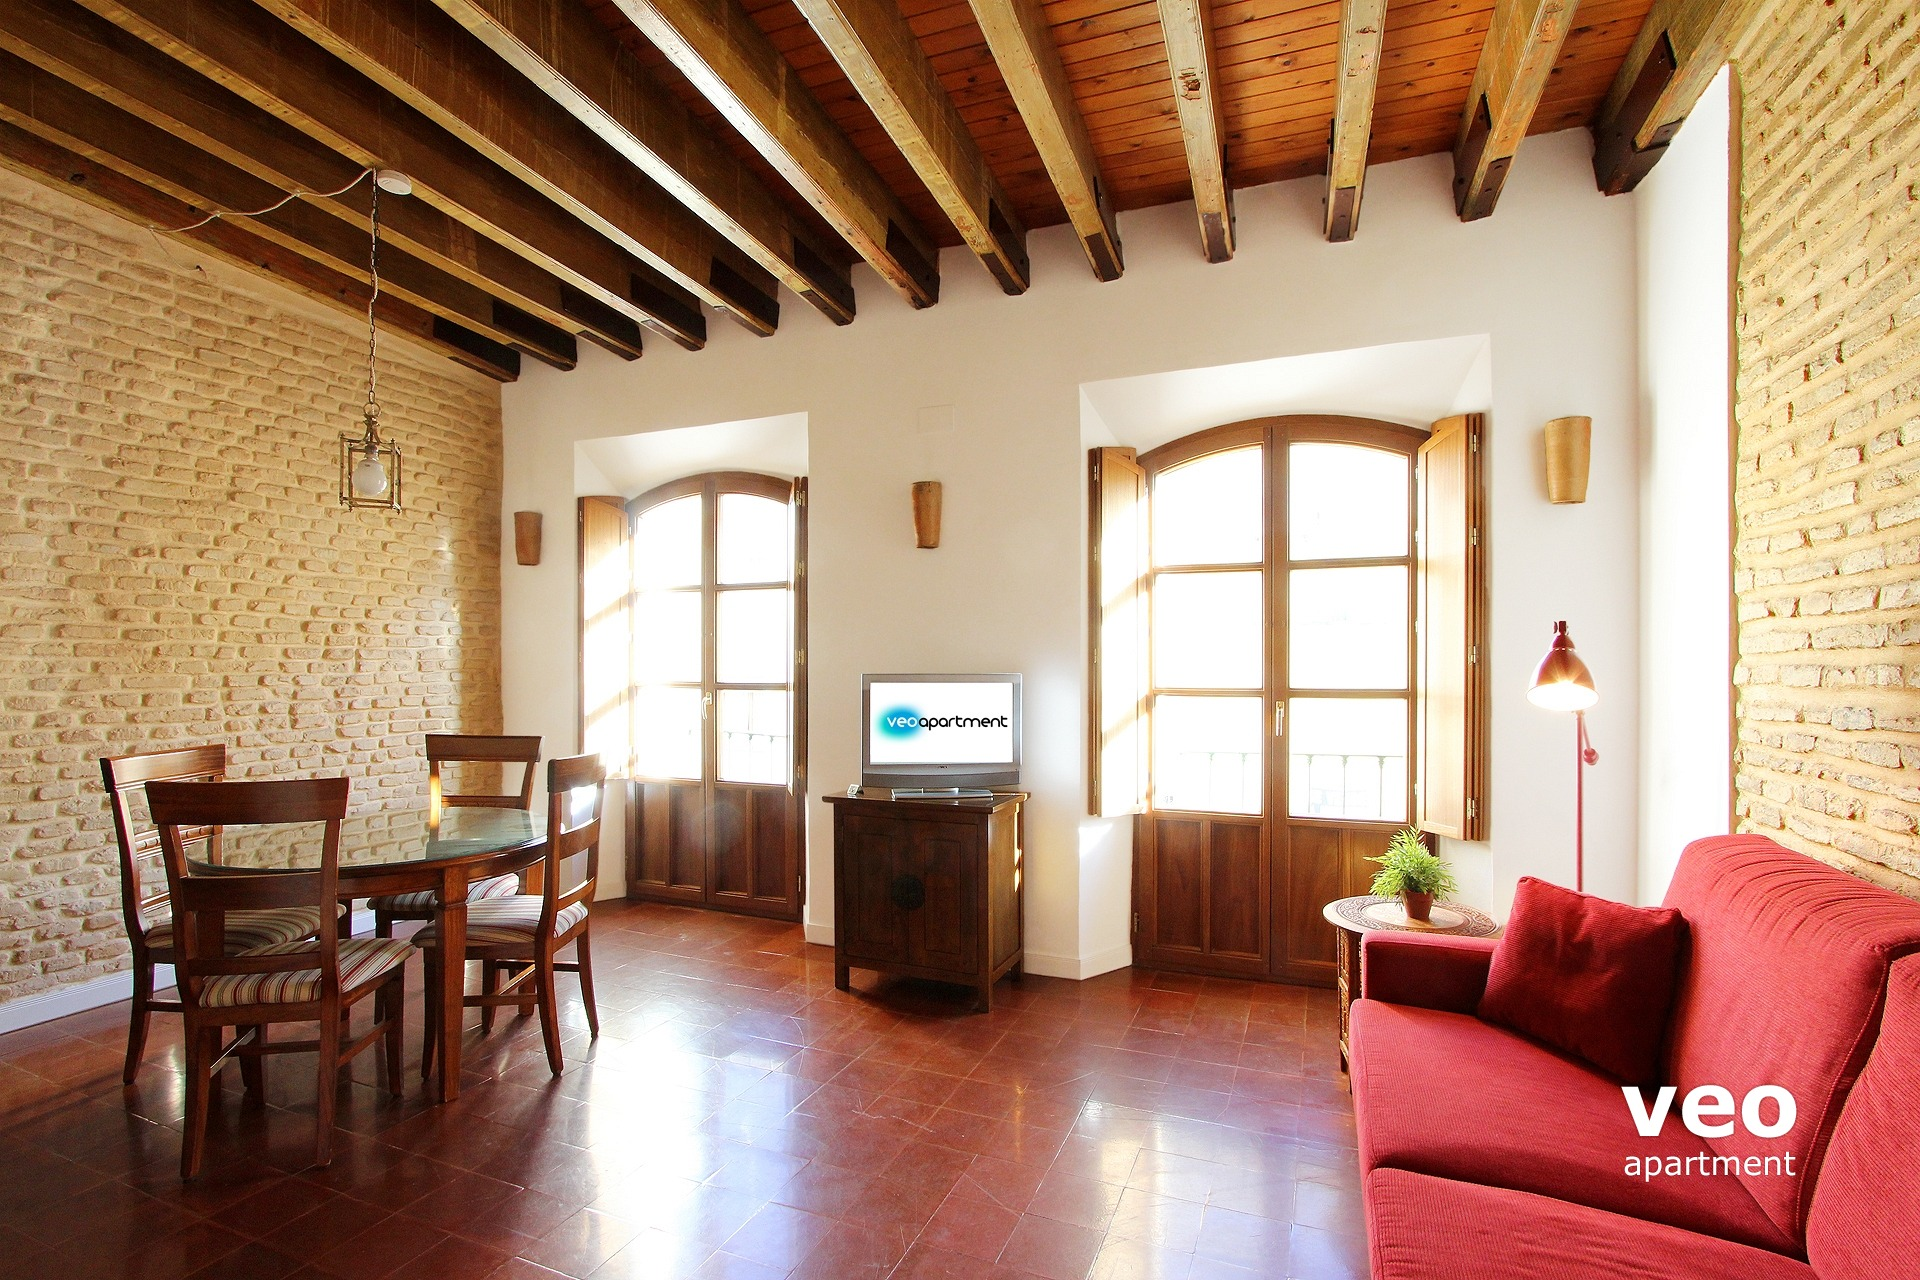 Apartment mieten Relator Strasse Sevilla Spanien | Relator 2 ...